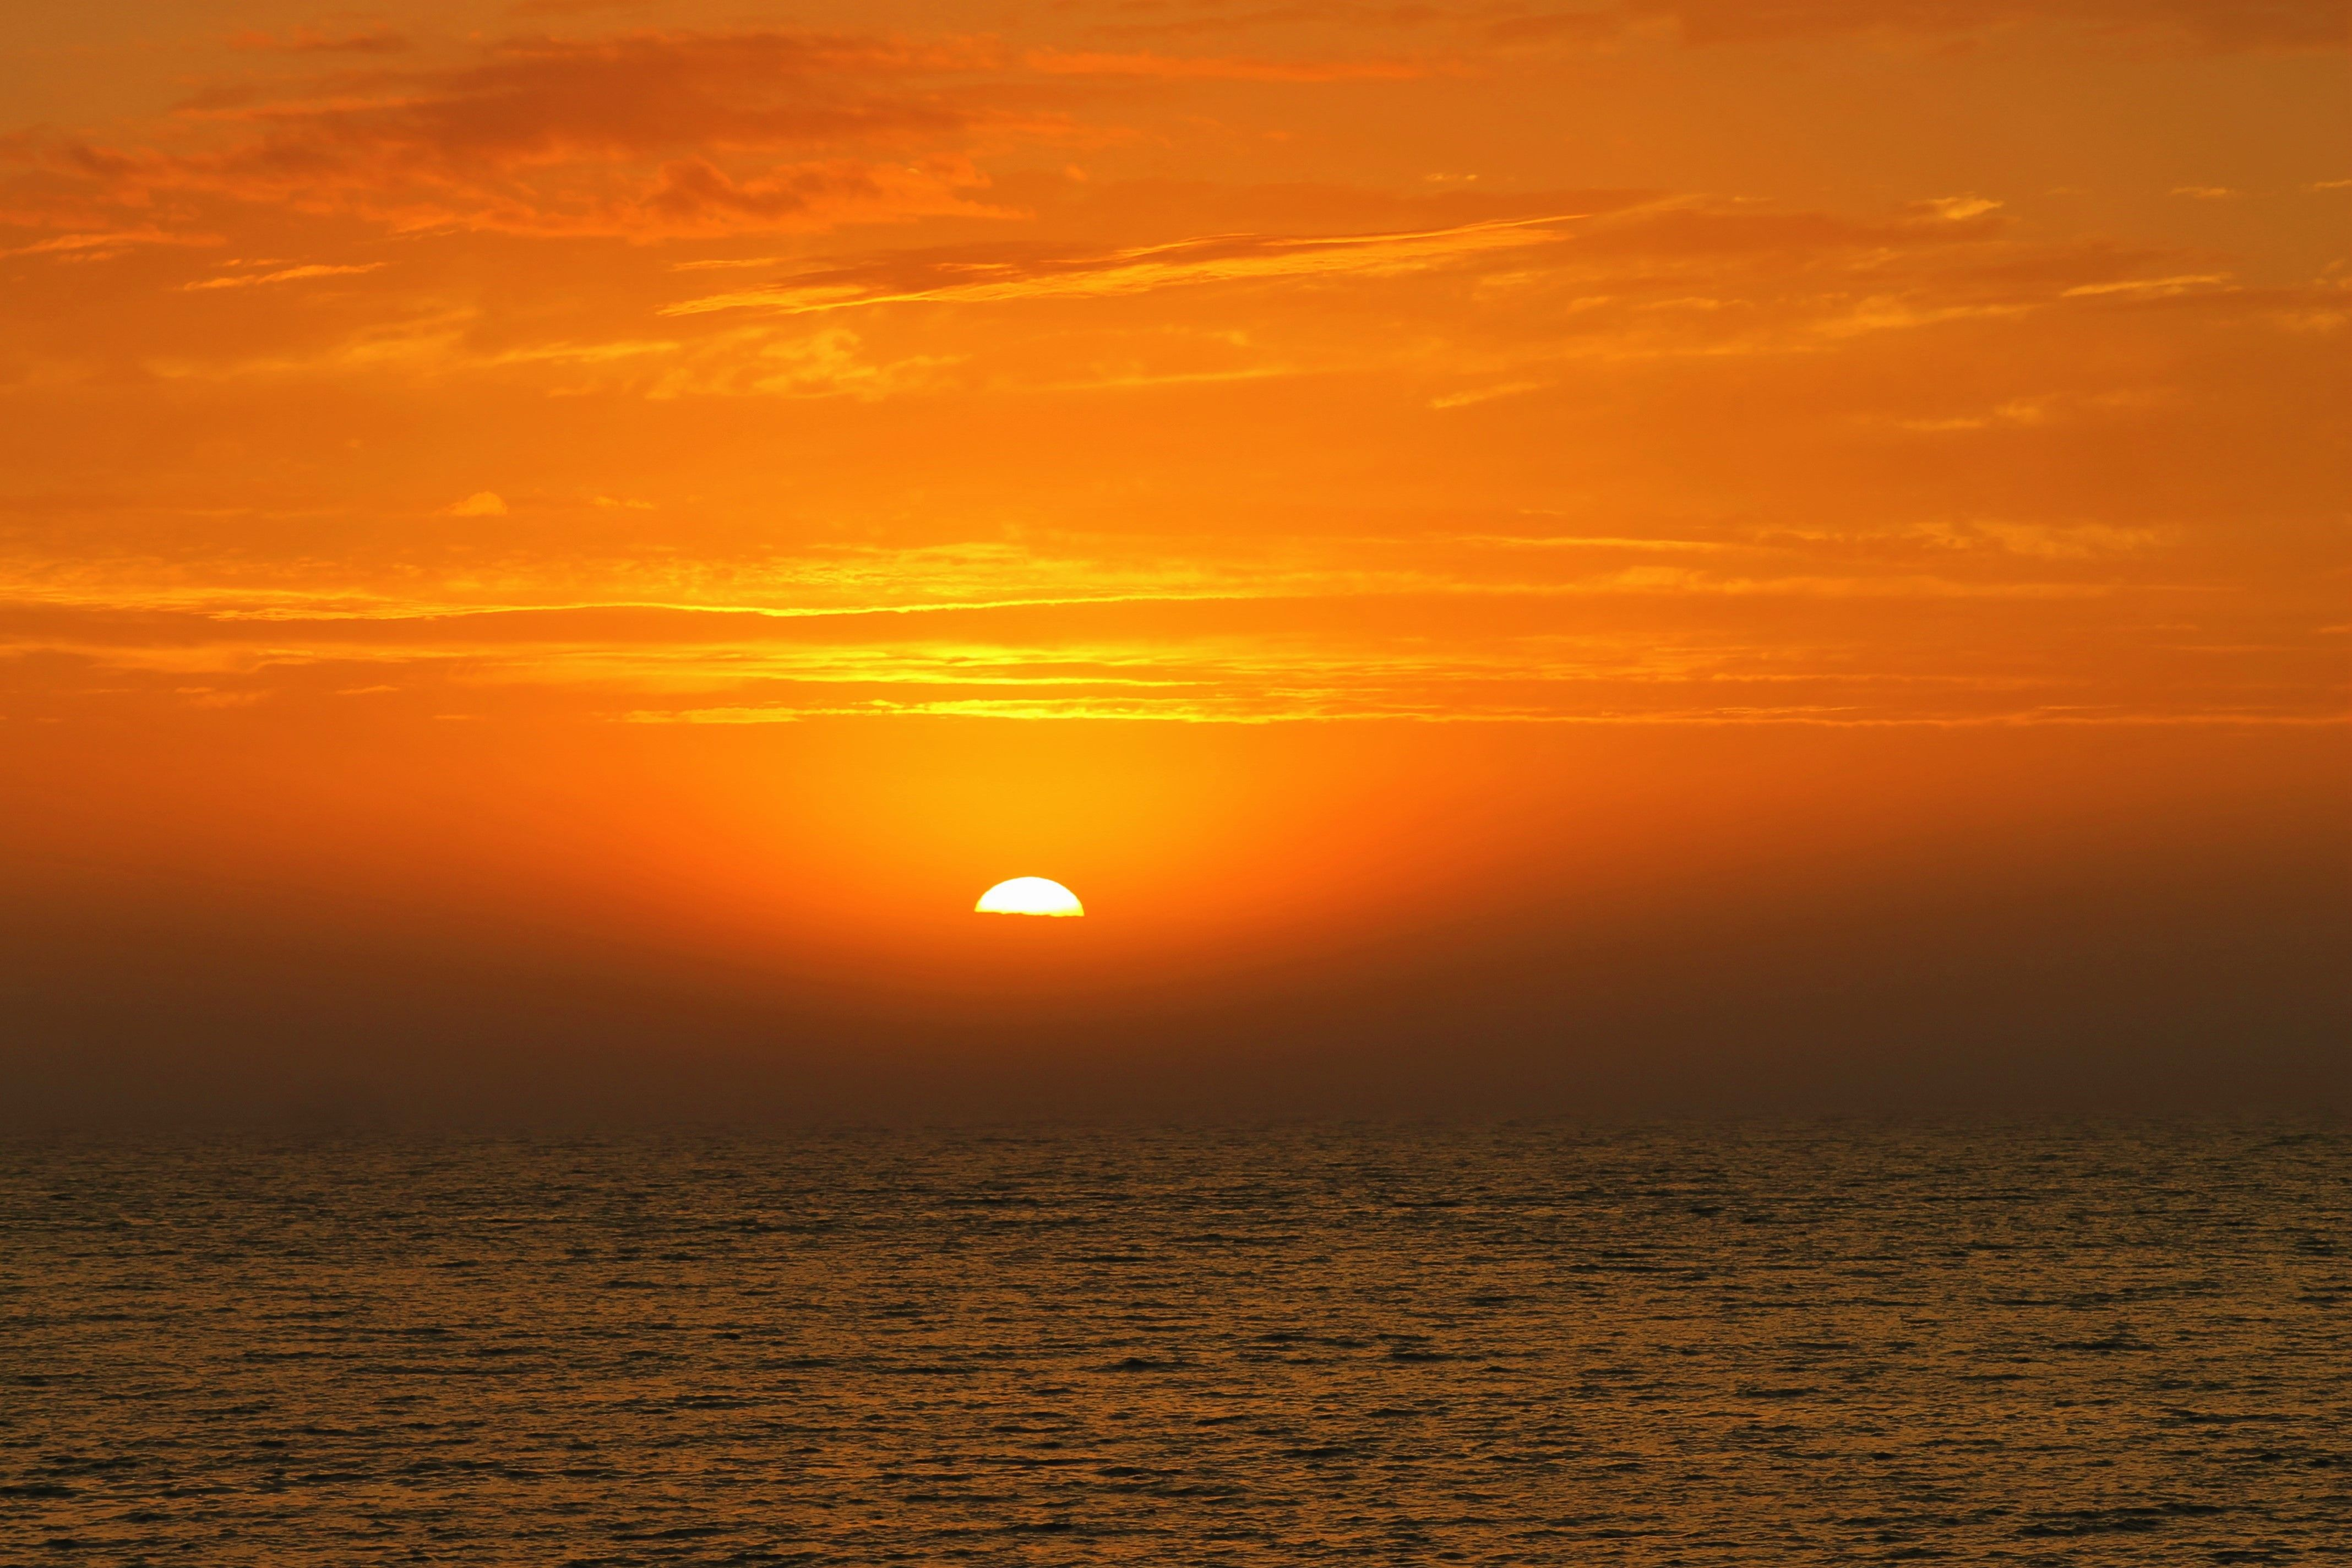 Beautiful sunset in Dalhousie, New Brunswick where ocean meets mountains